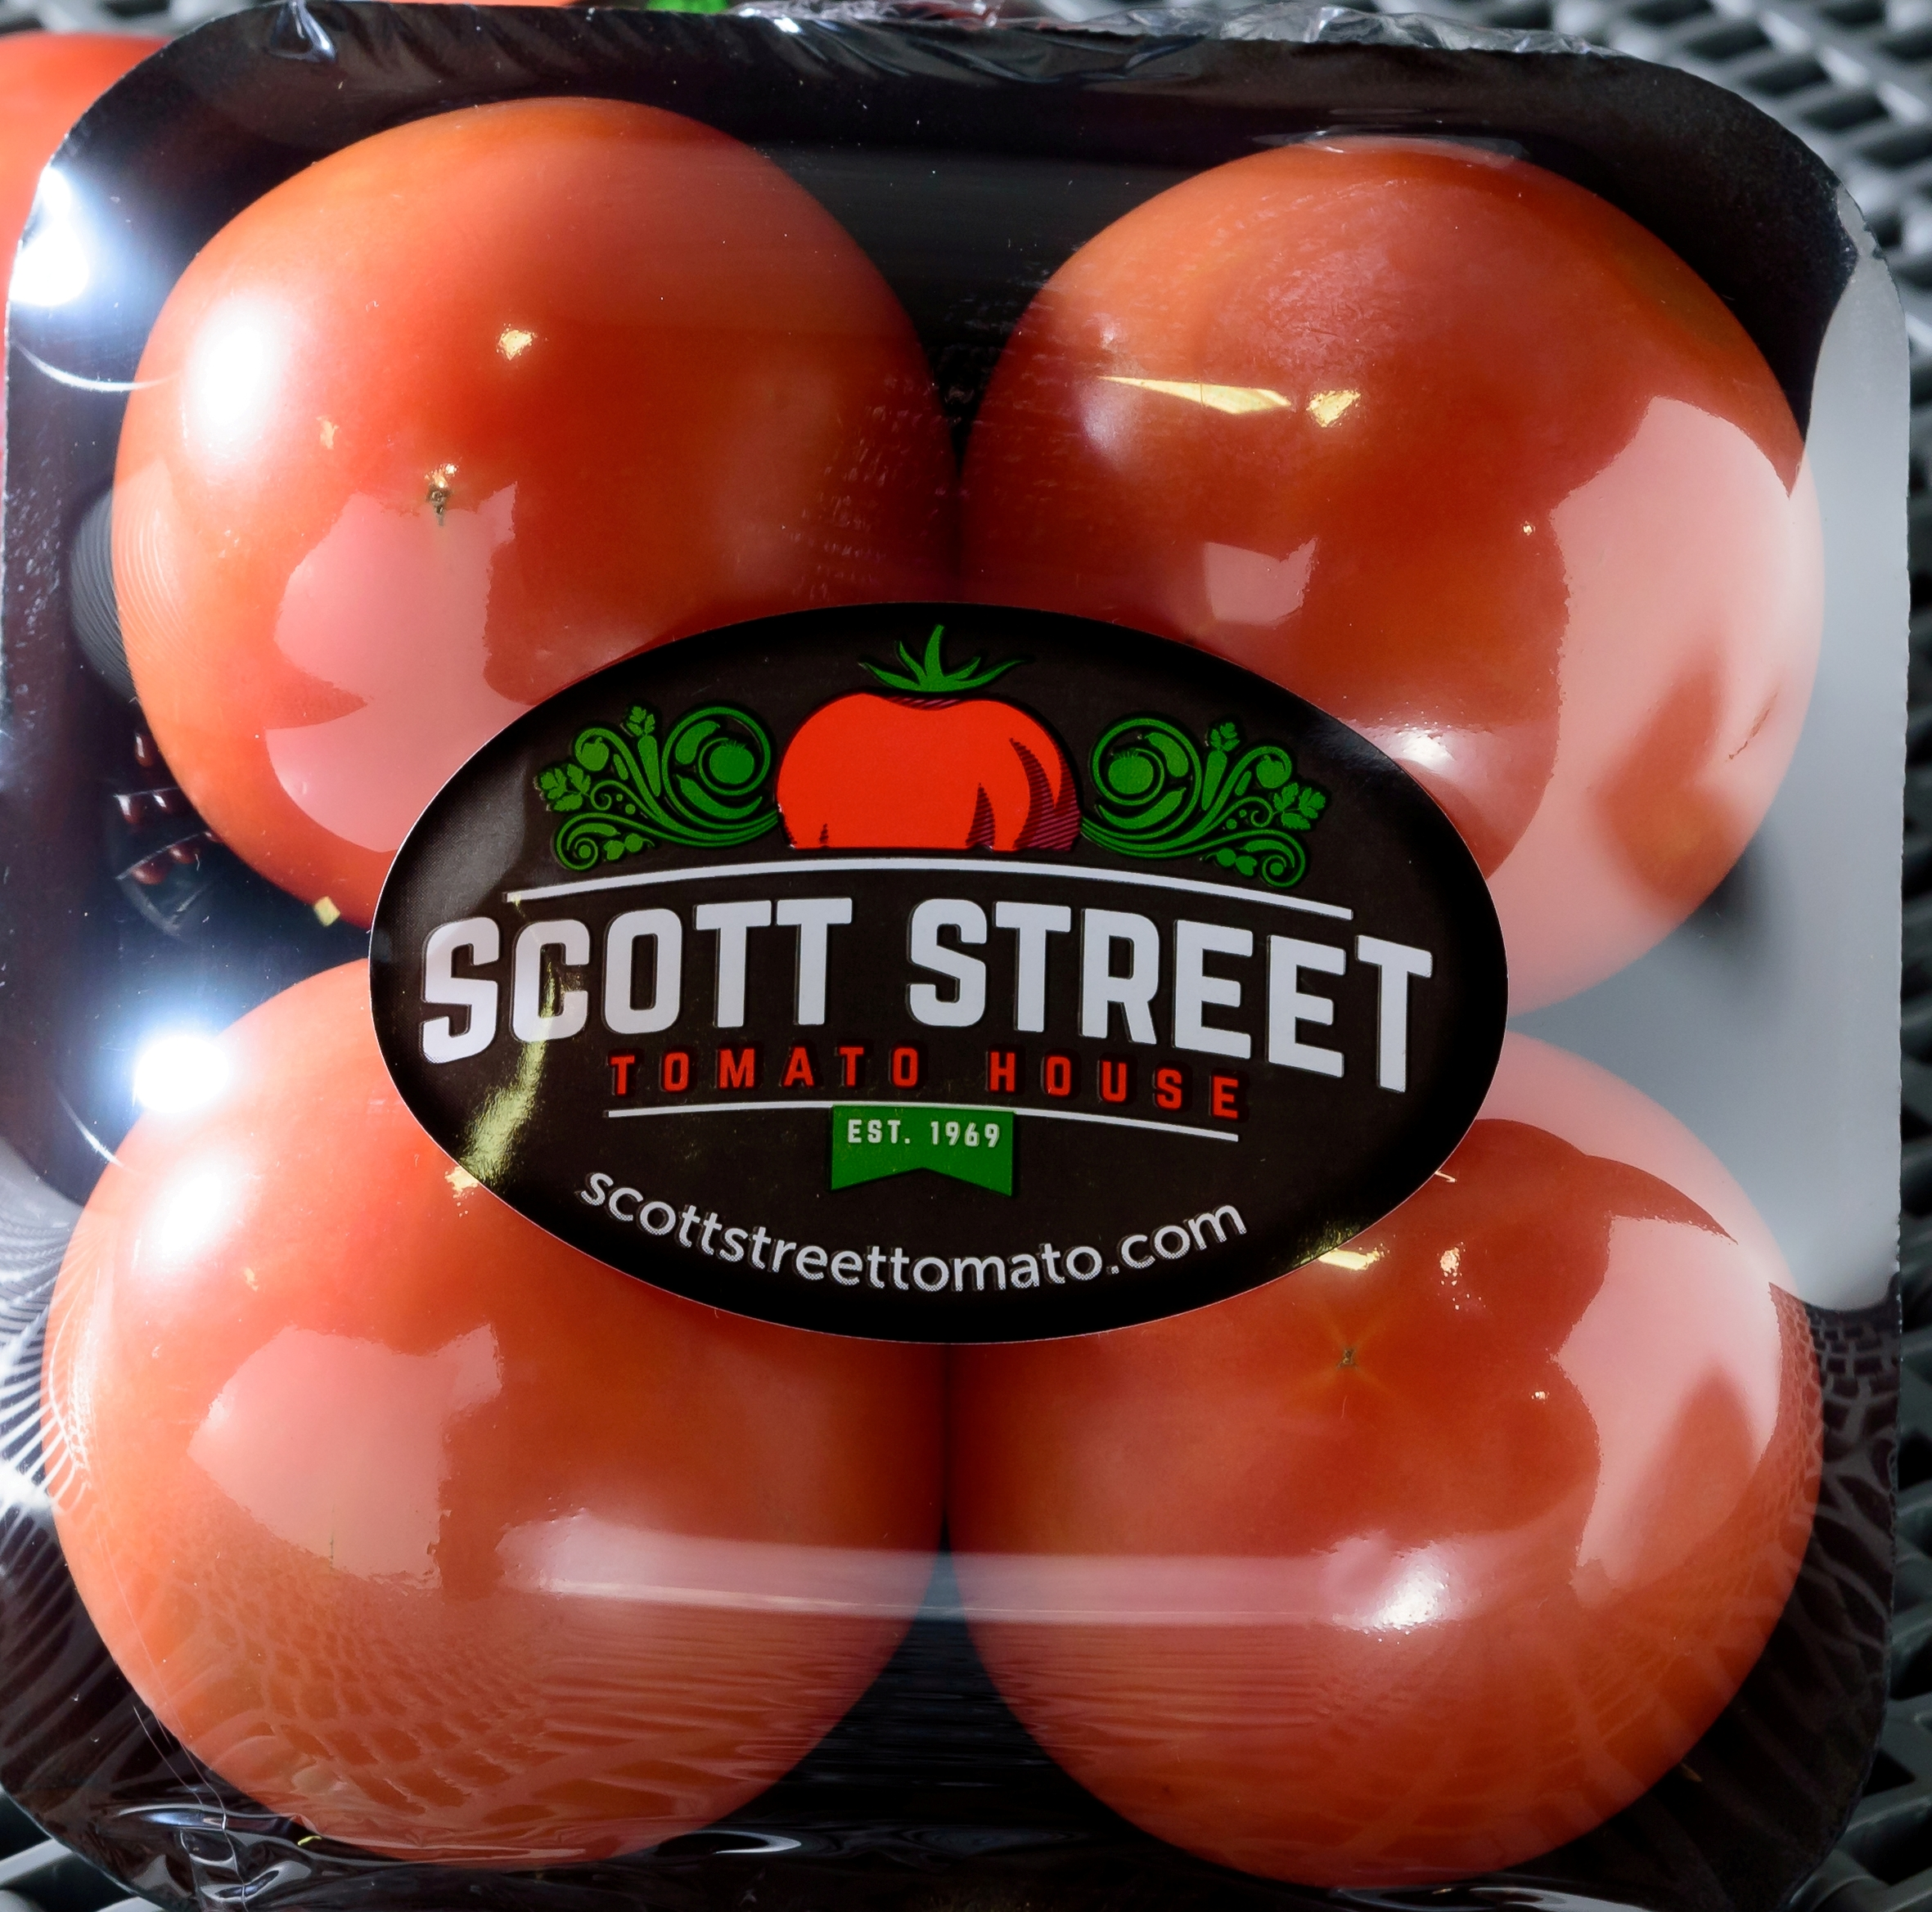 Scott Street Tomato 2651 Faxon Ave Memphis Tn 38112 Yp Com